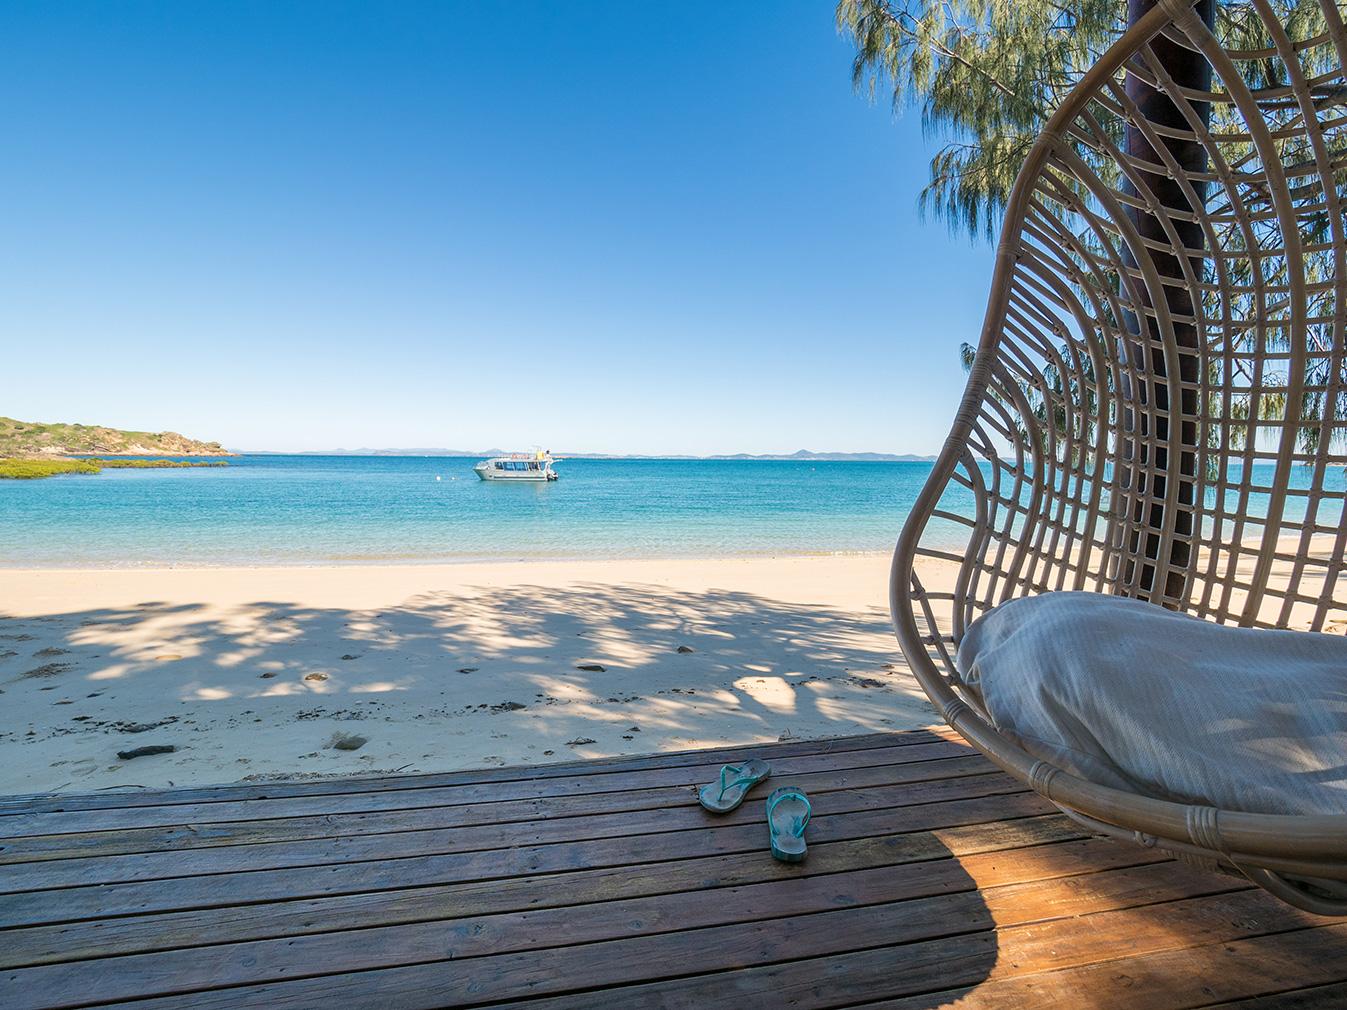 Pumpkin Island lies 14km off the coast of Yeppoon, Queensland, between Brisbane and Cairns. It is for sale via  Knight Frank